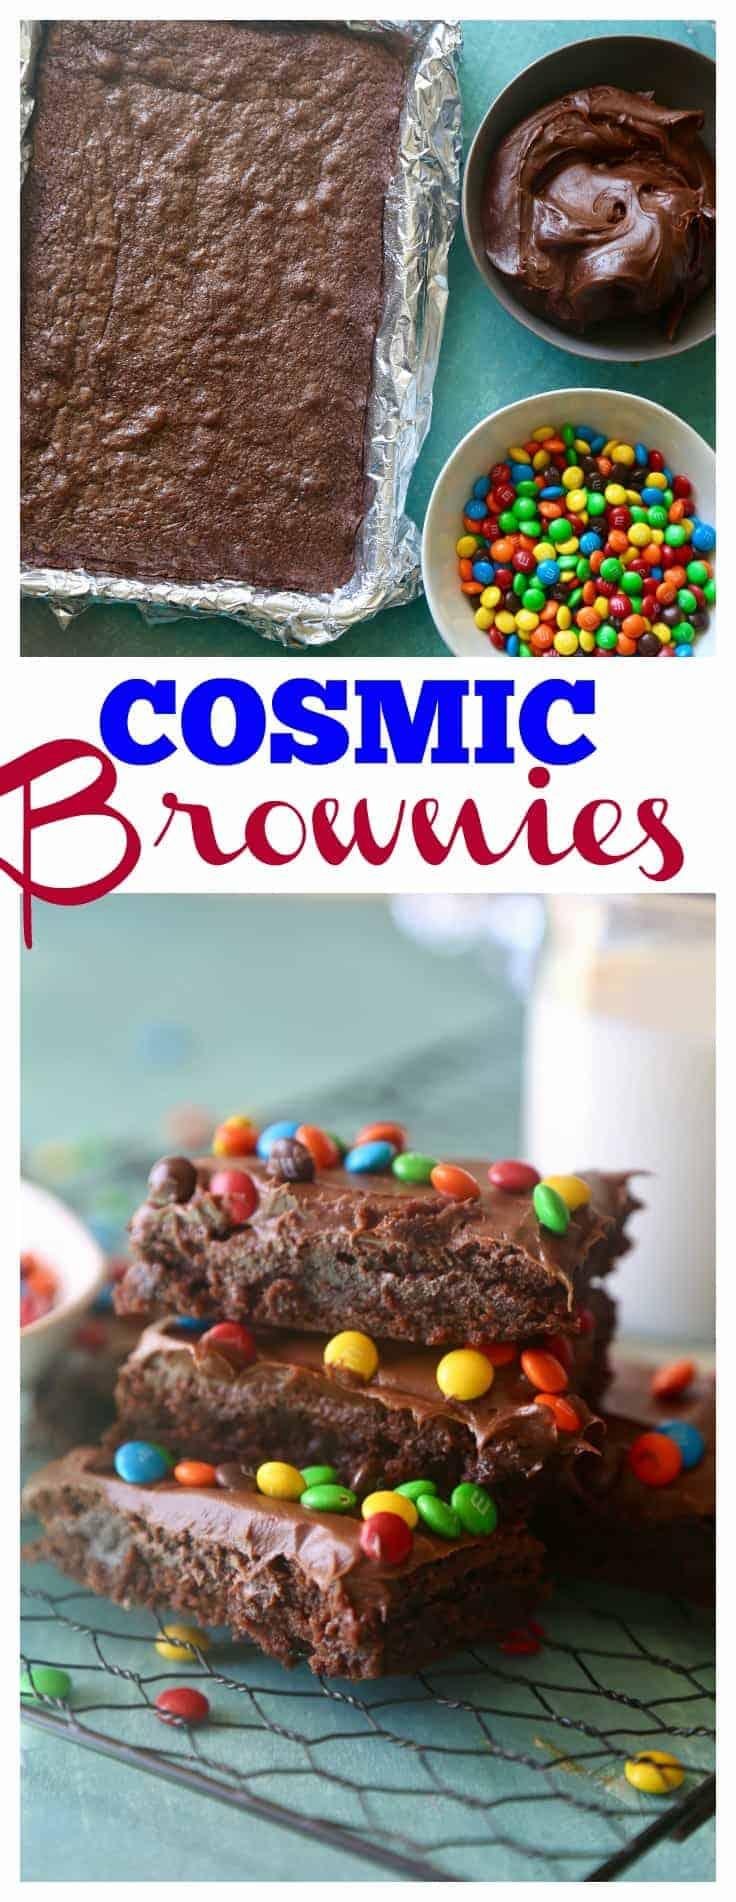 How to make Cosmic Brownies